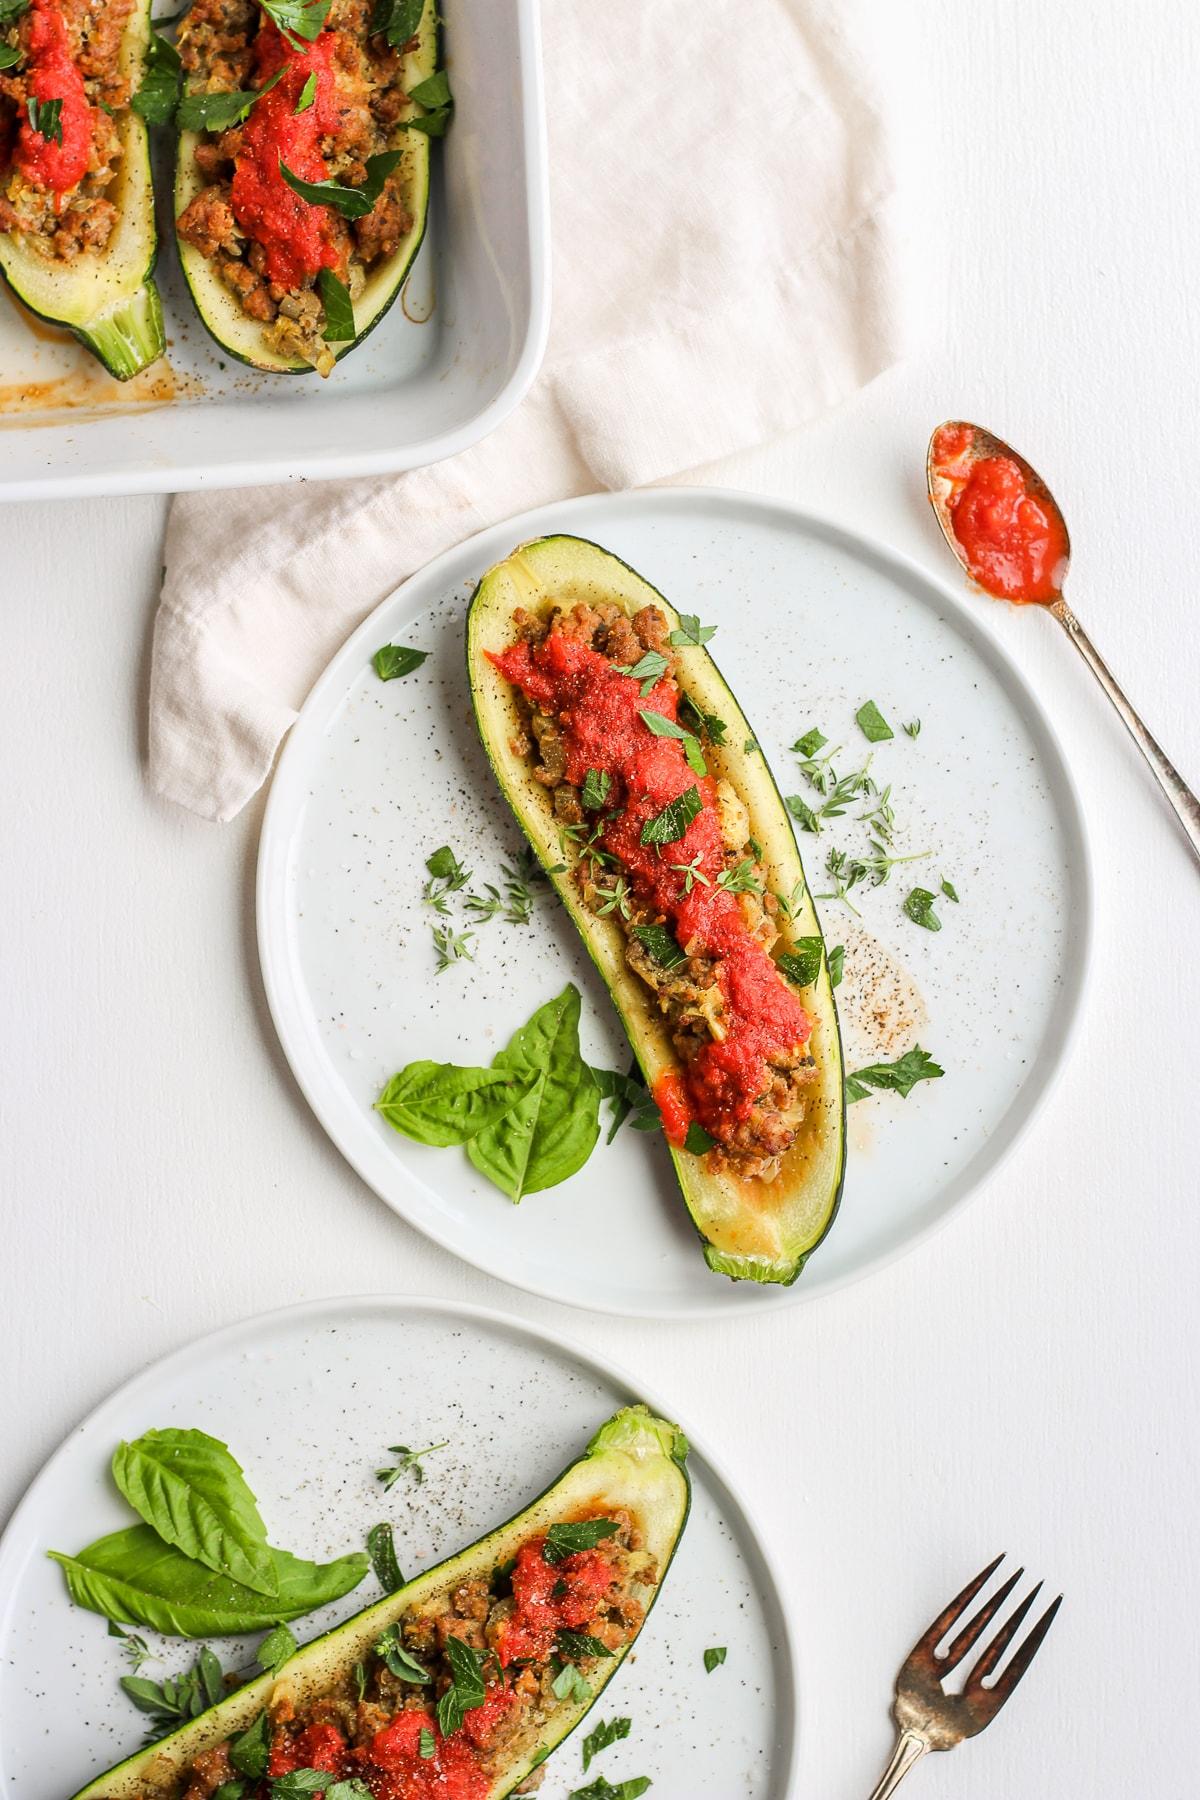 Healthy Italian Sausage Stuffed Zucchini - the perfect way to use your summer zucchini! #whole30 #dairyfree